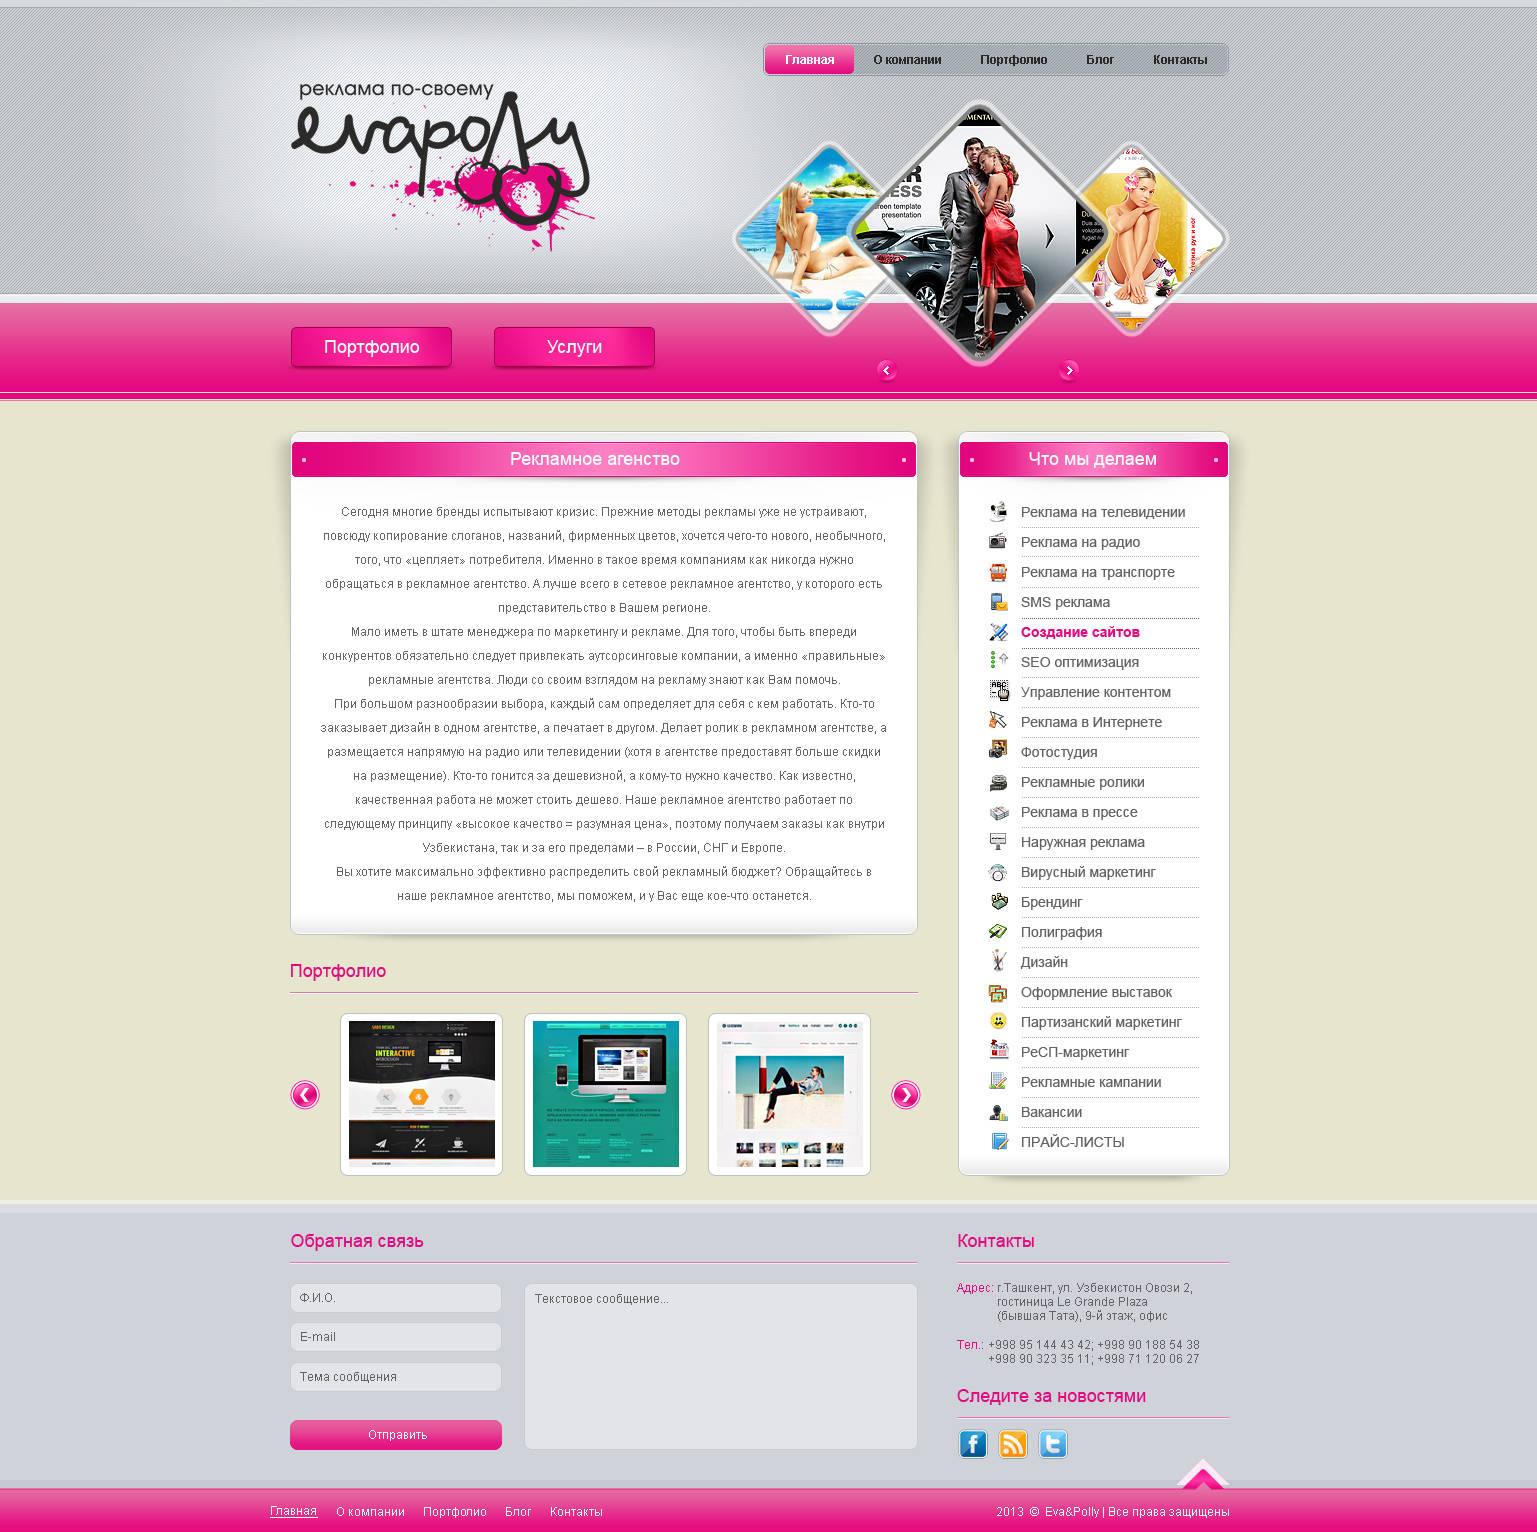 Рекламное агенство Eva&Polly